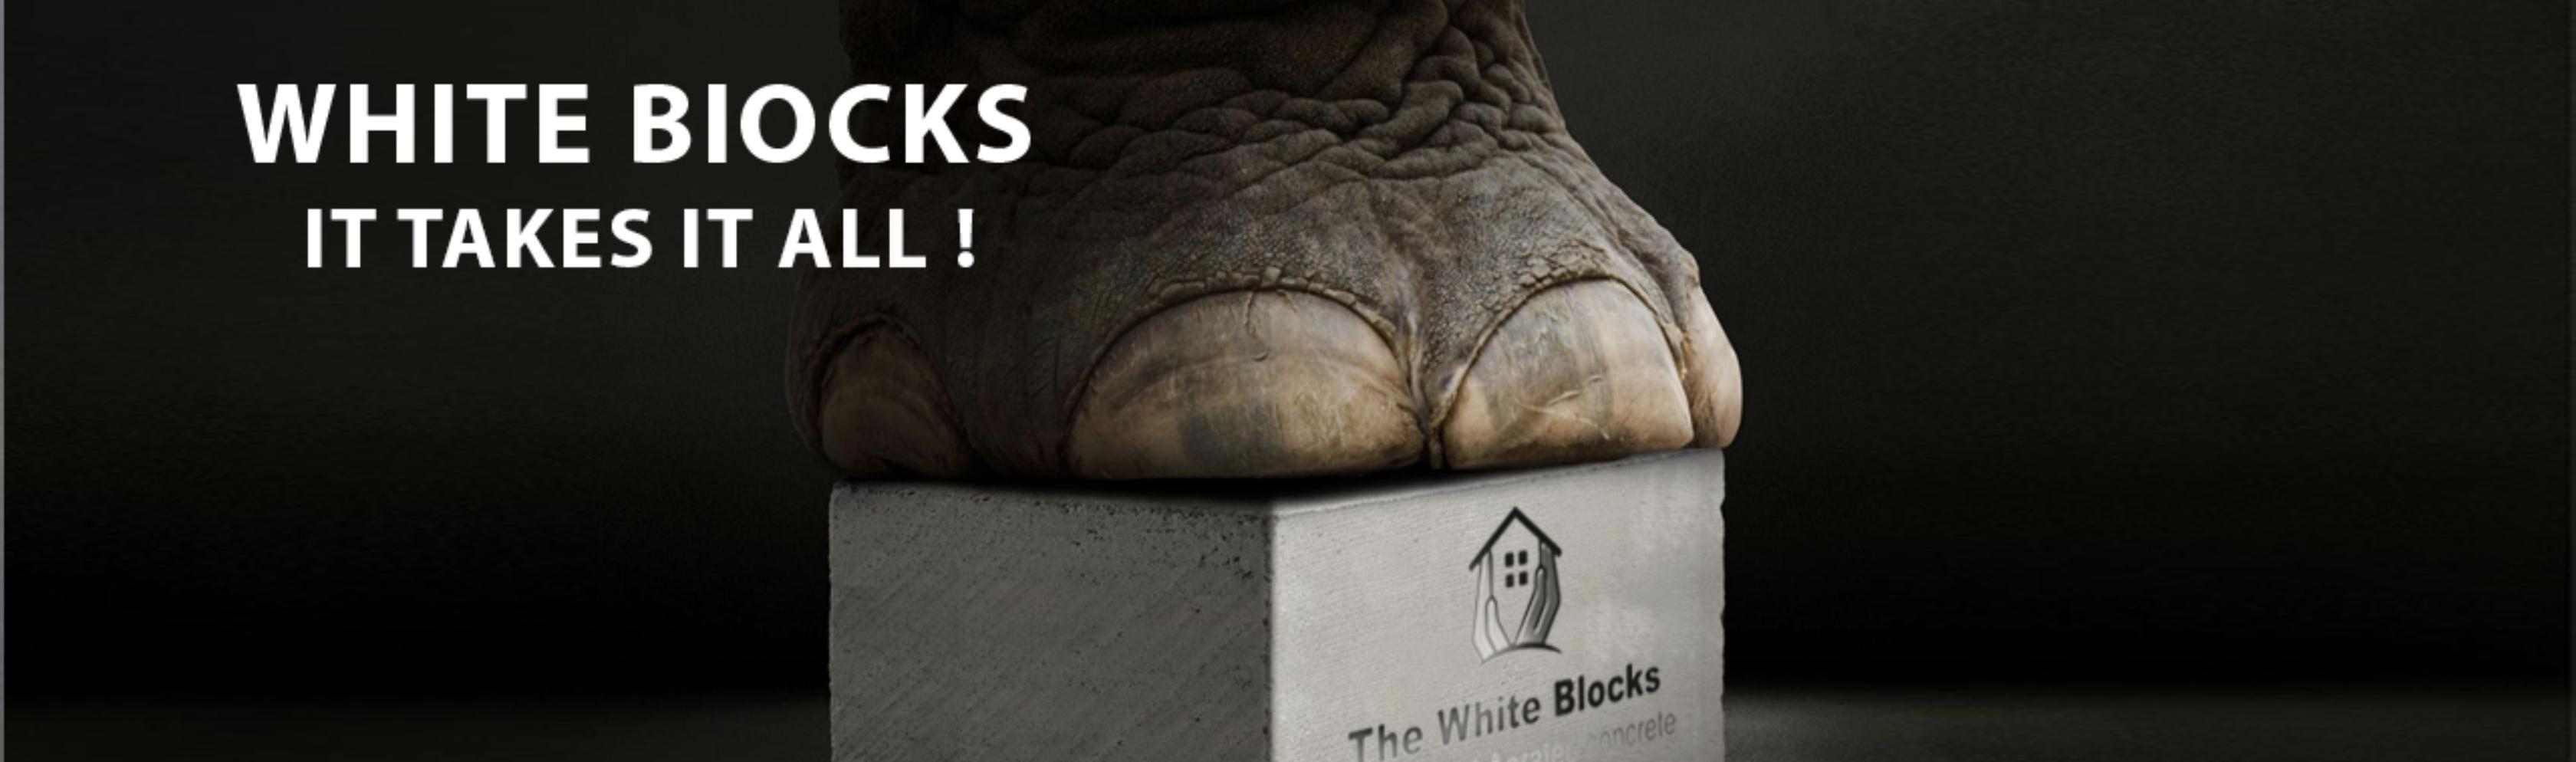 The White Blocks